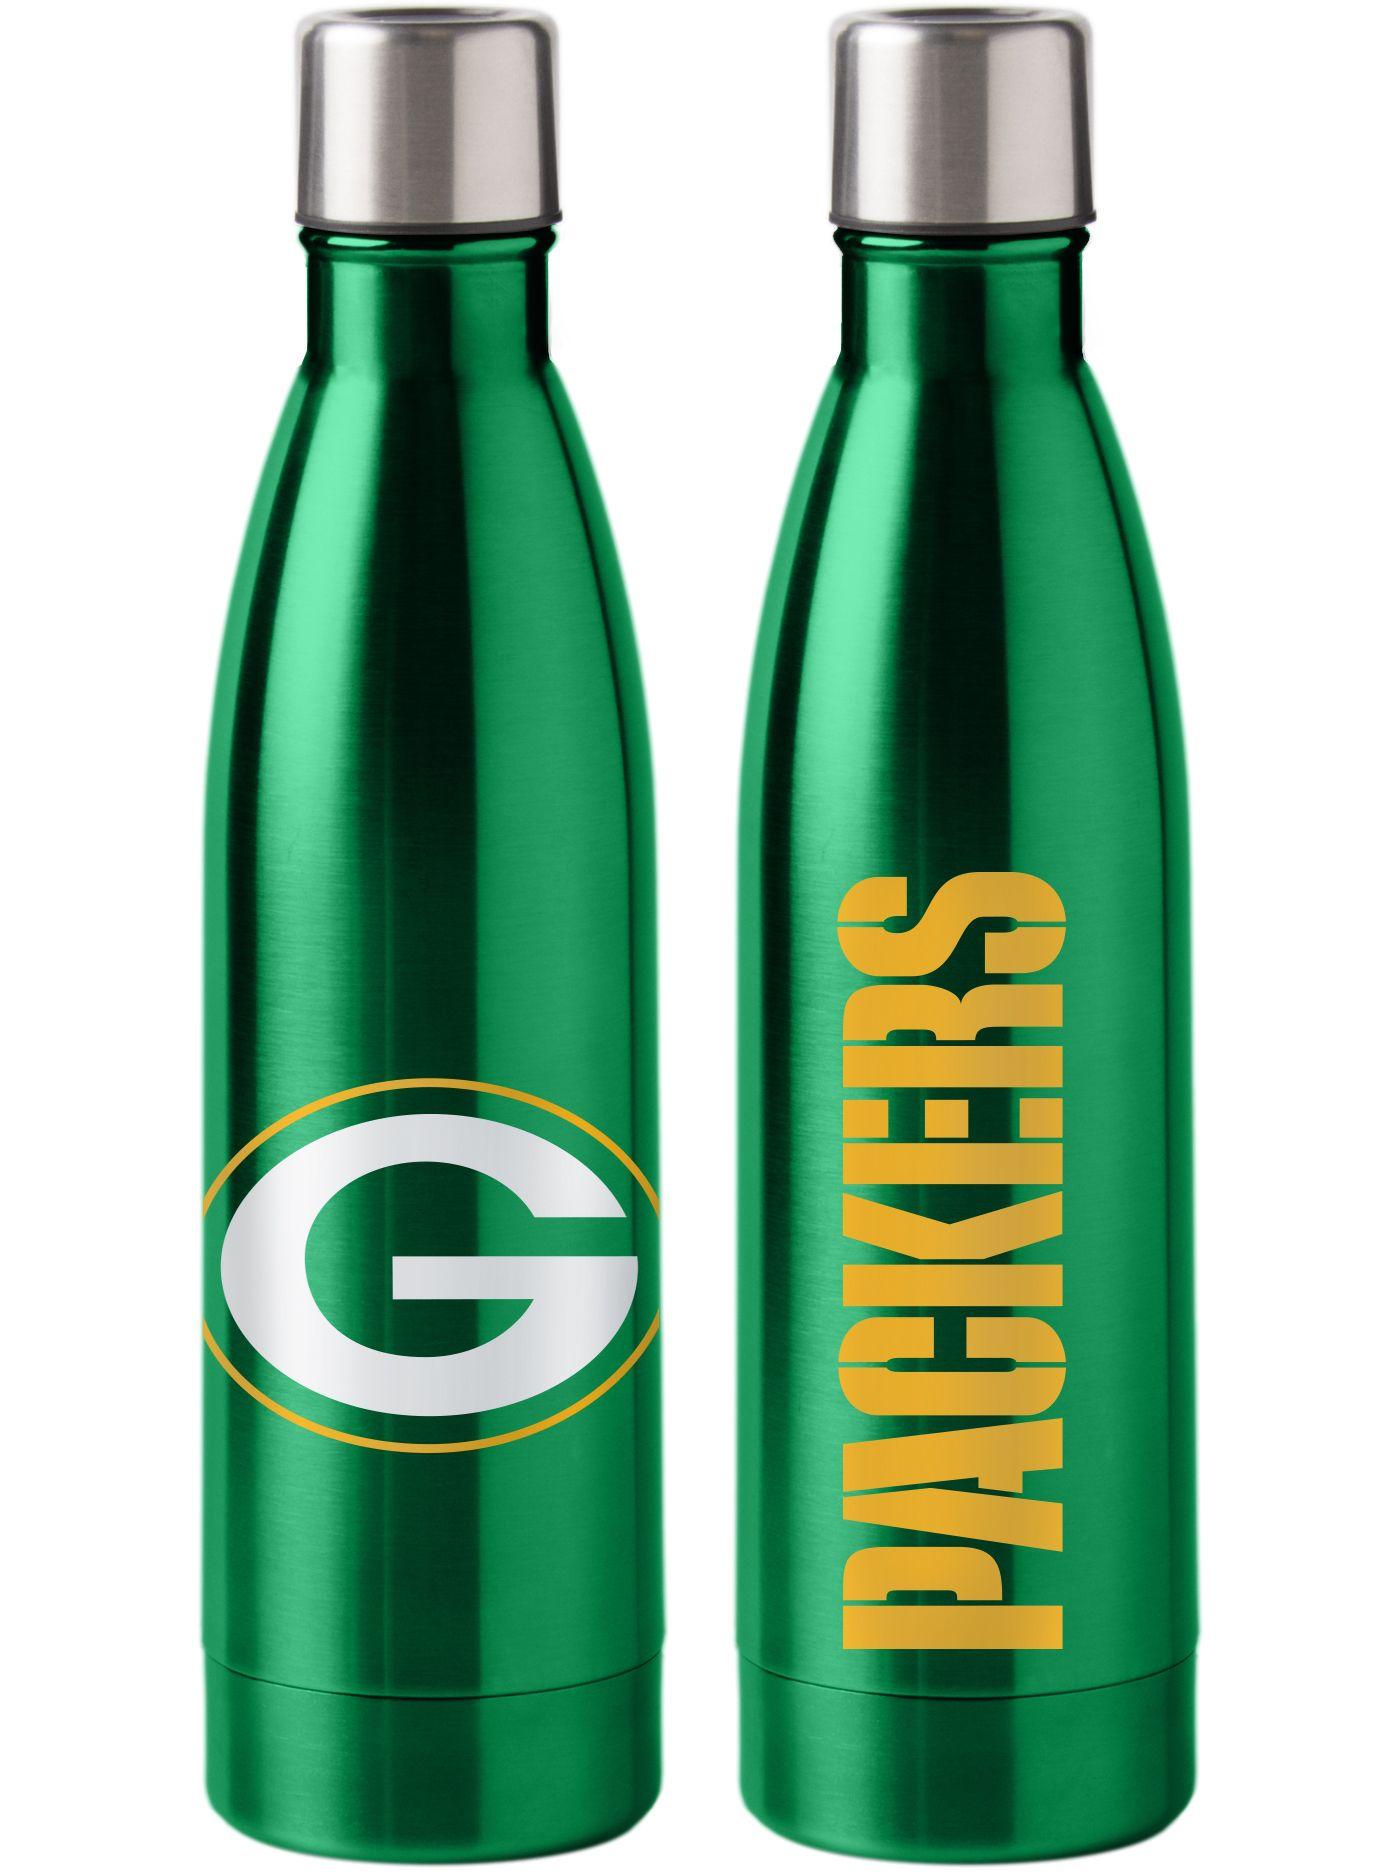 Boelter Green Bay Packers Stainless Steel Water Bottle